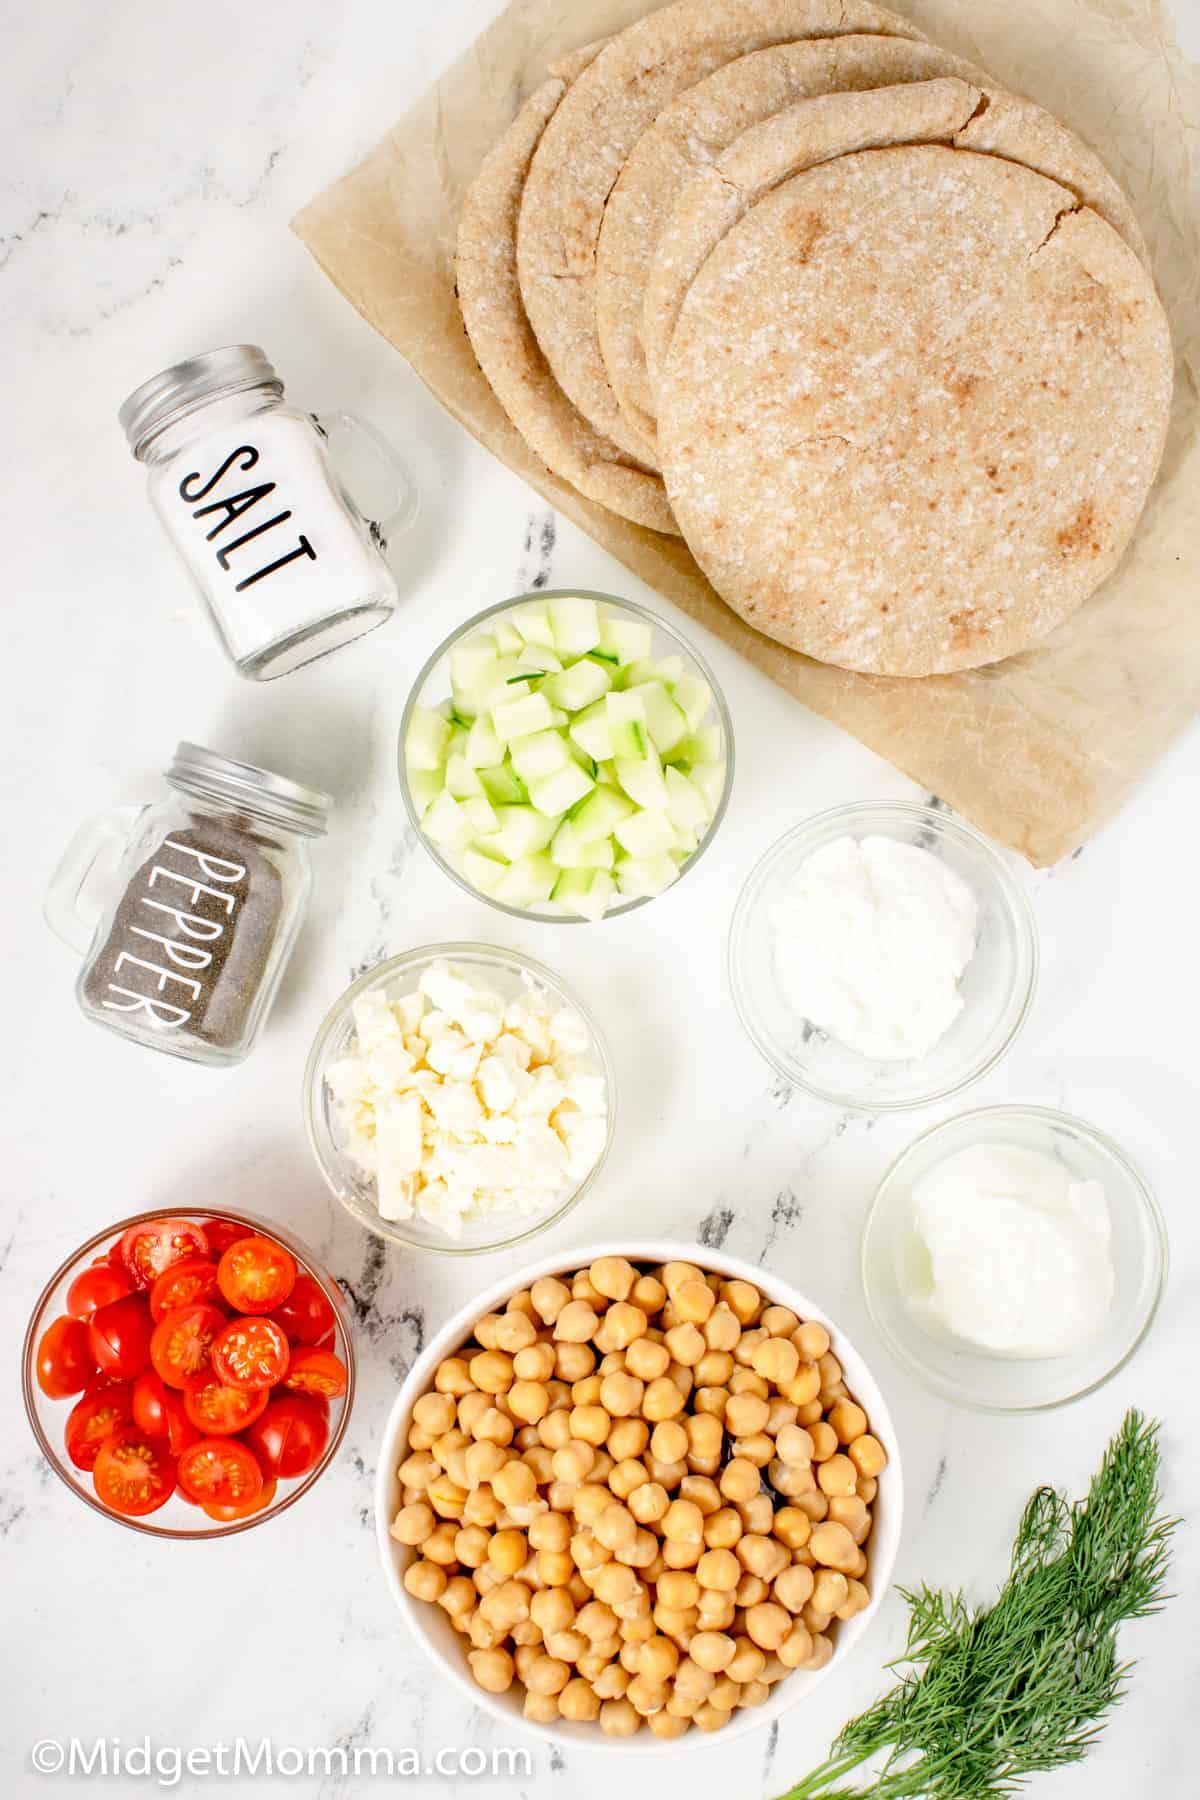 Greek Pita Sandwich ingredients